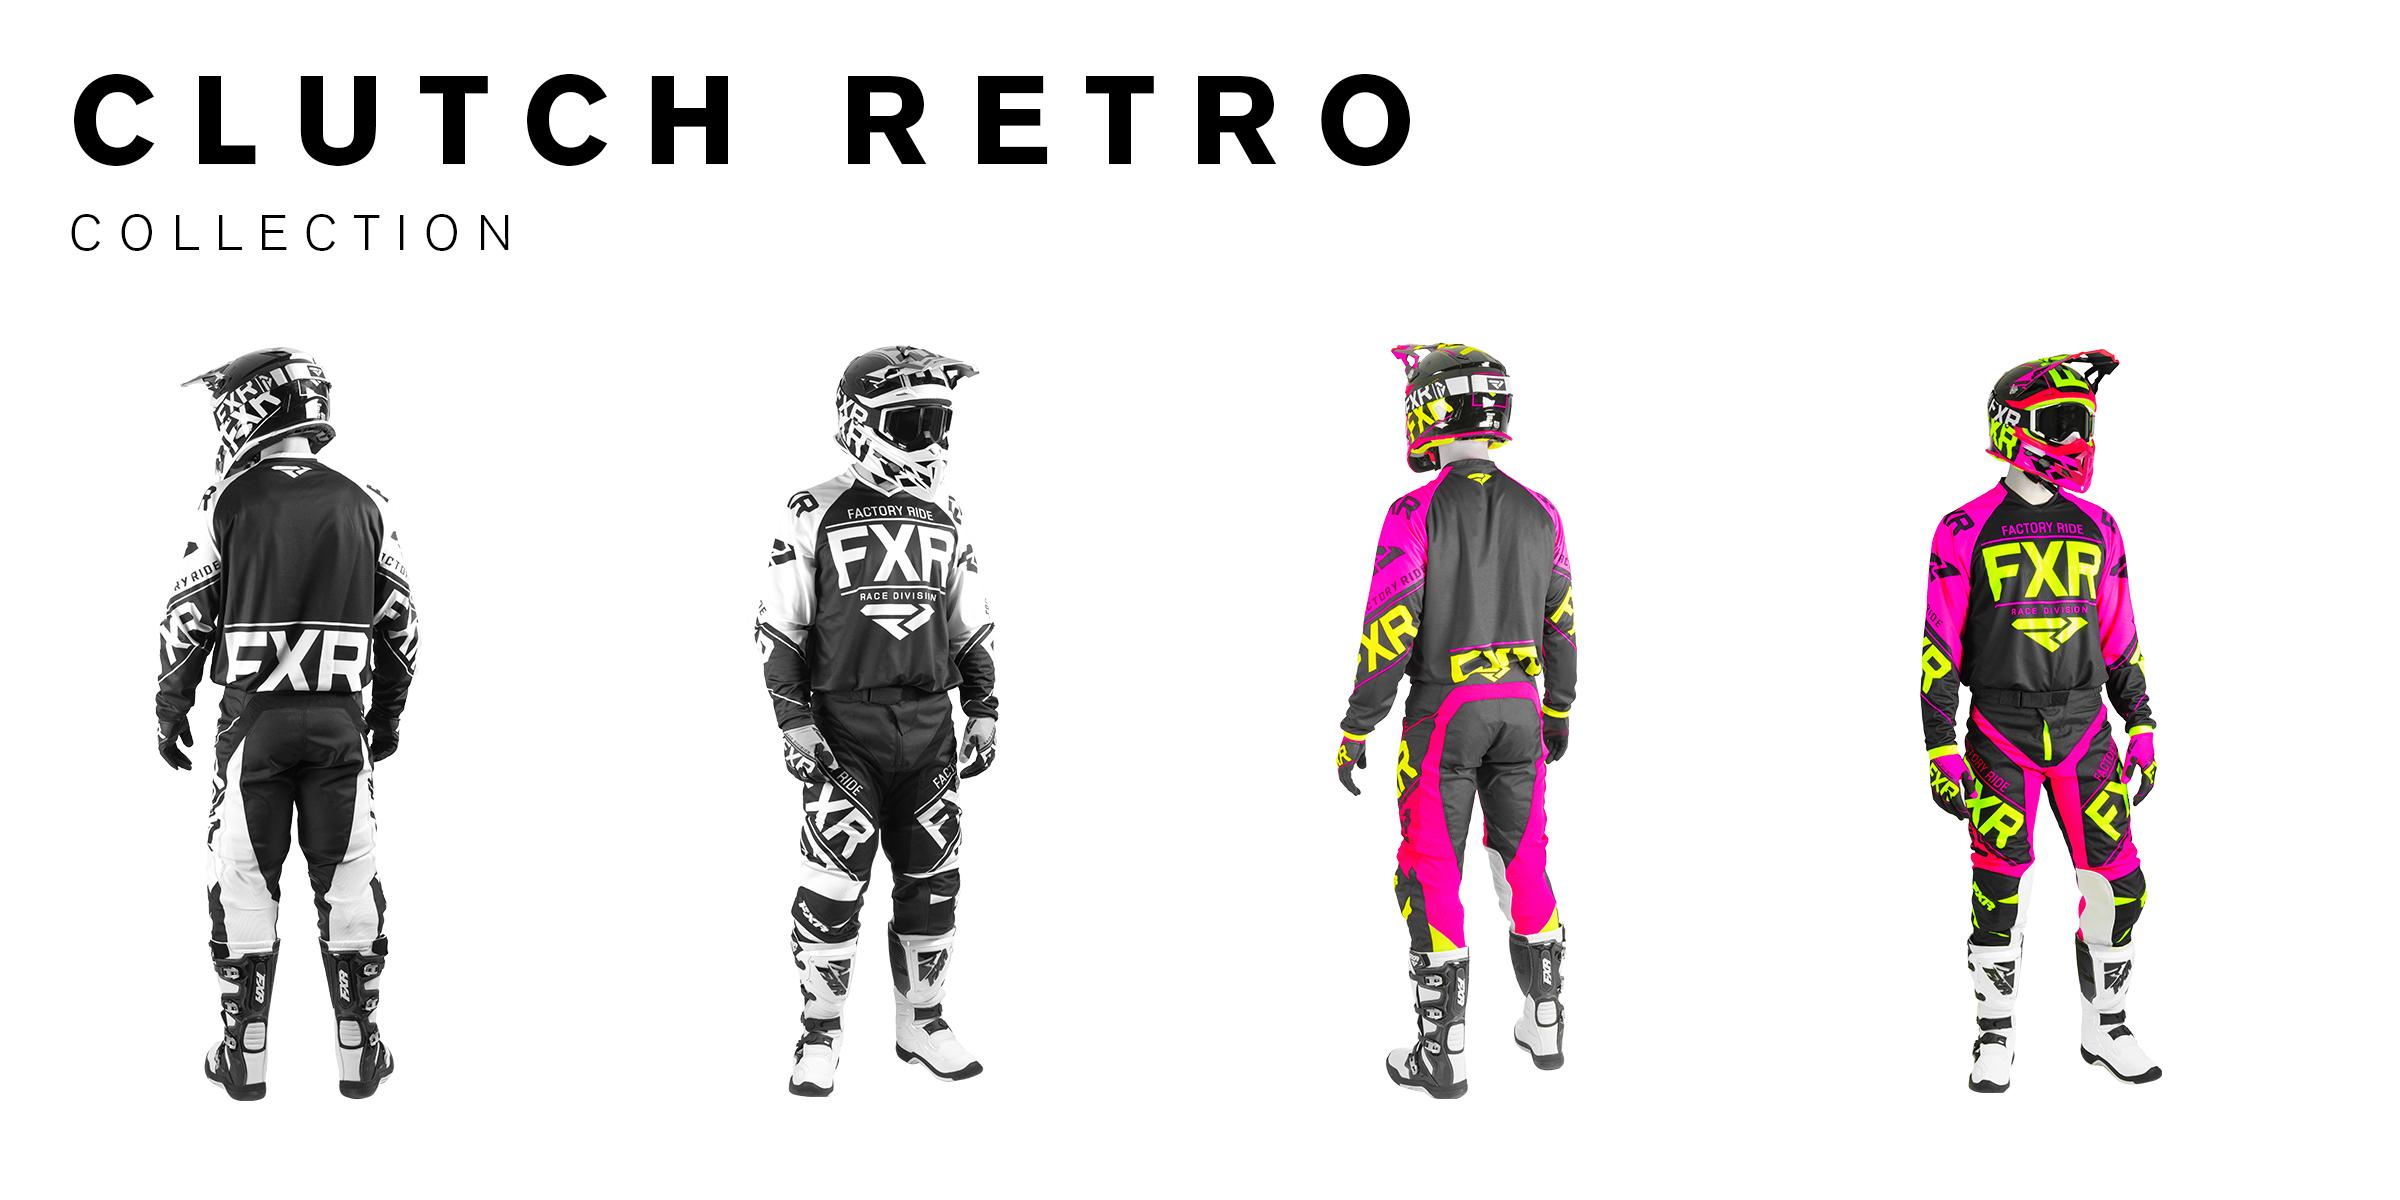 2018 Clutch Retro Collection 1.jpg